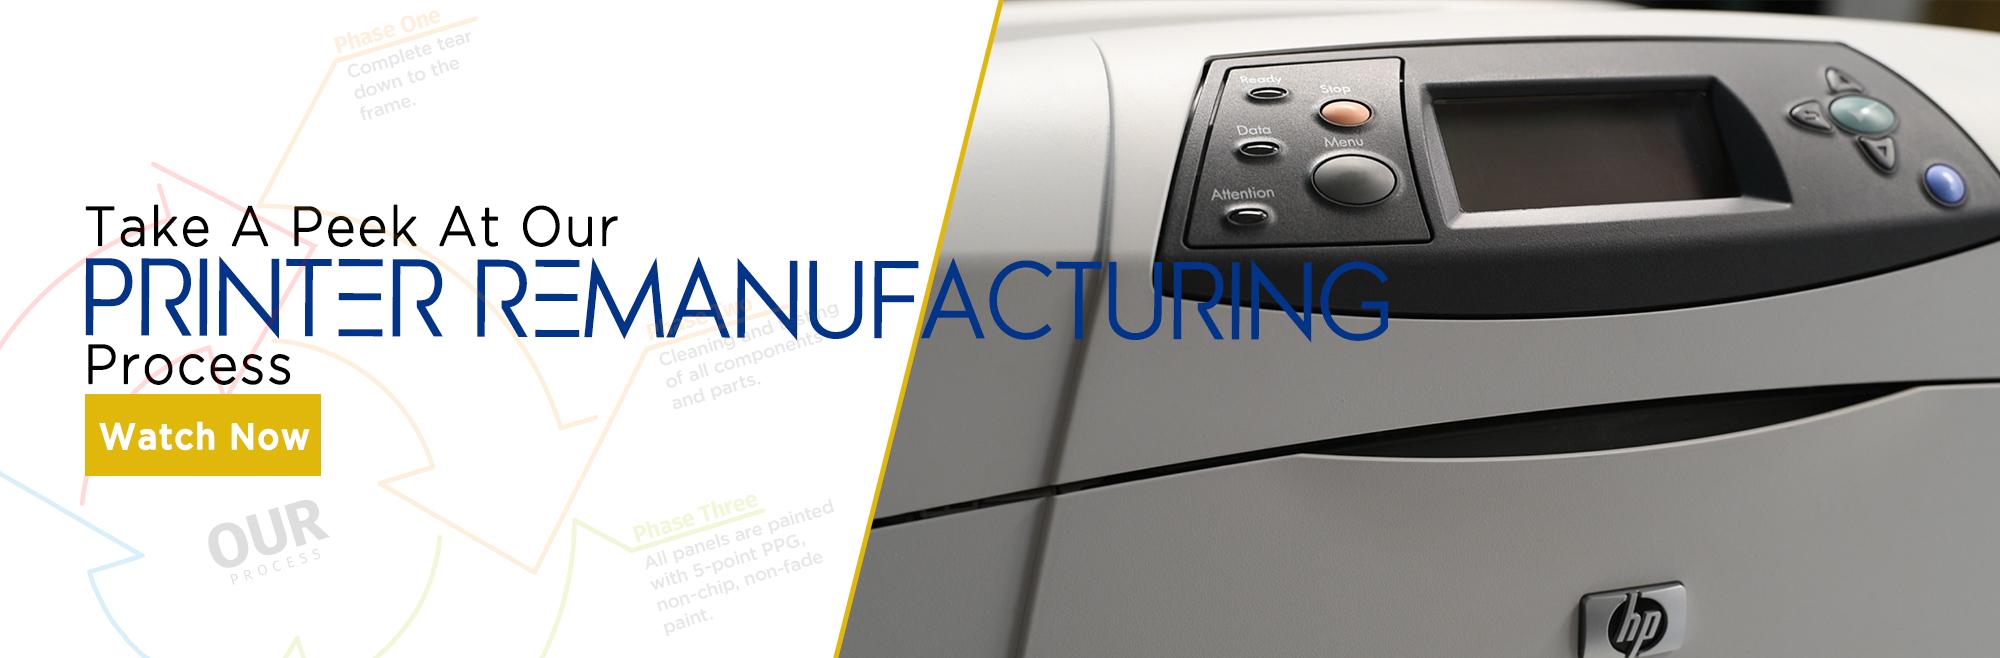 Gold Standard Printer Remanufacturing